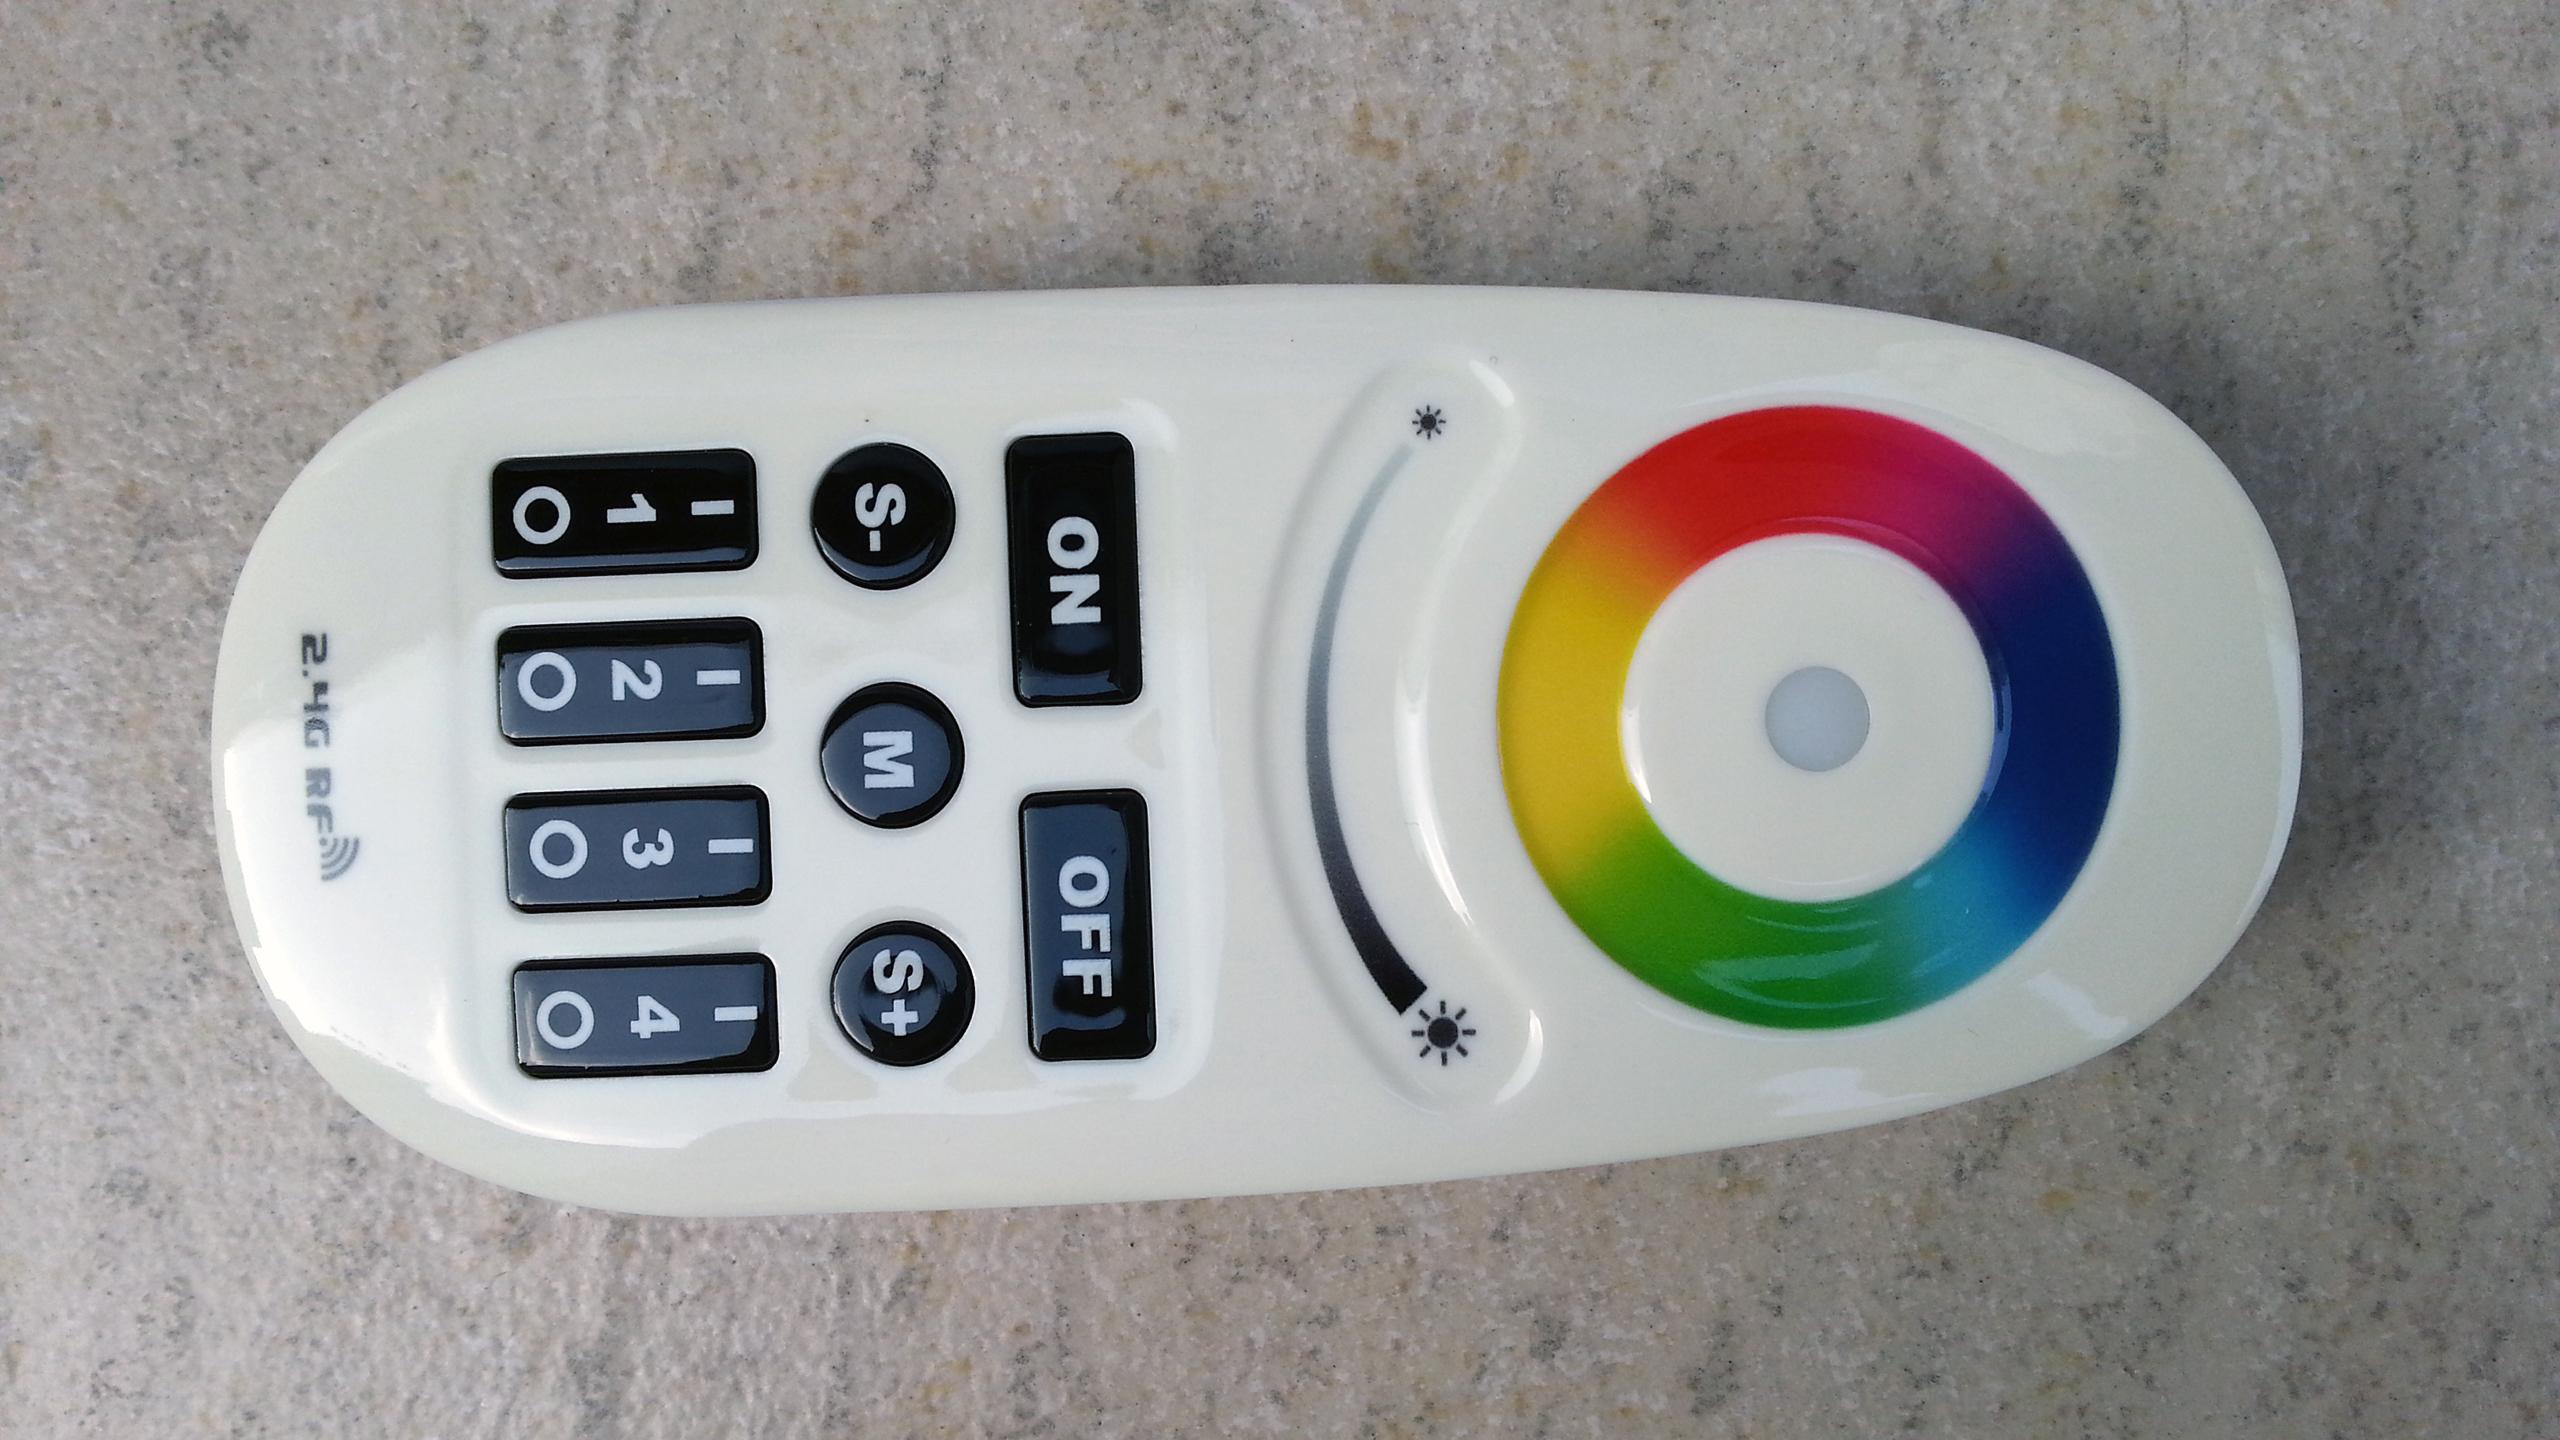 2.4G_RF_wireless_remote_control_panel